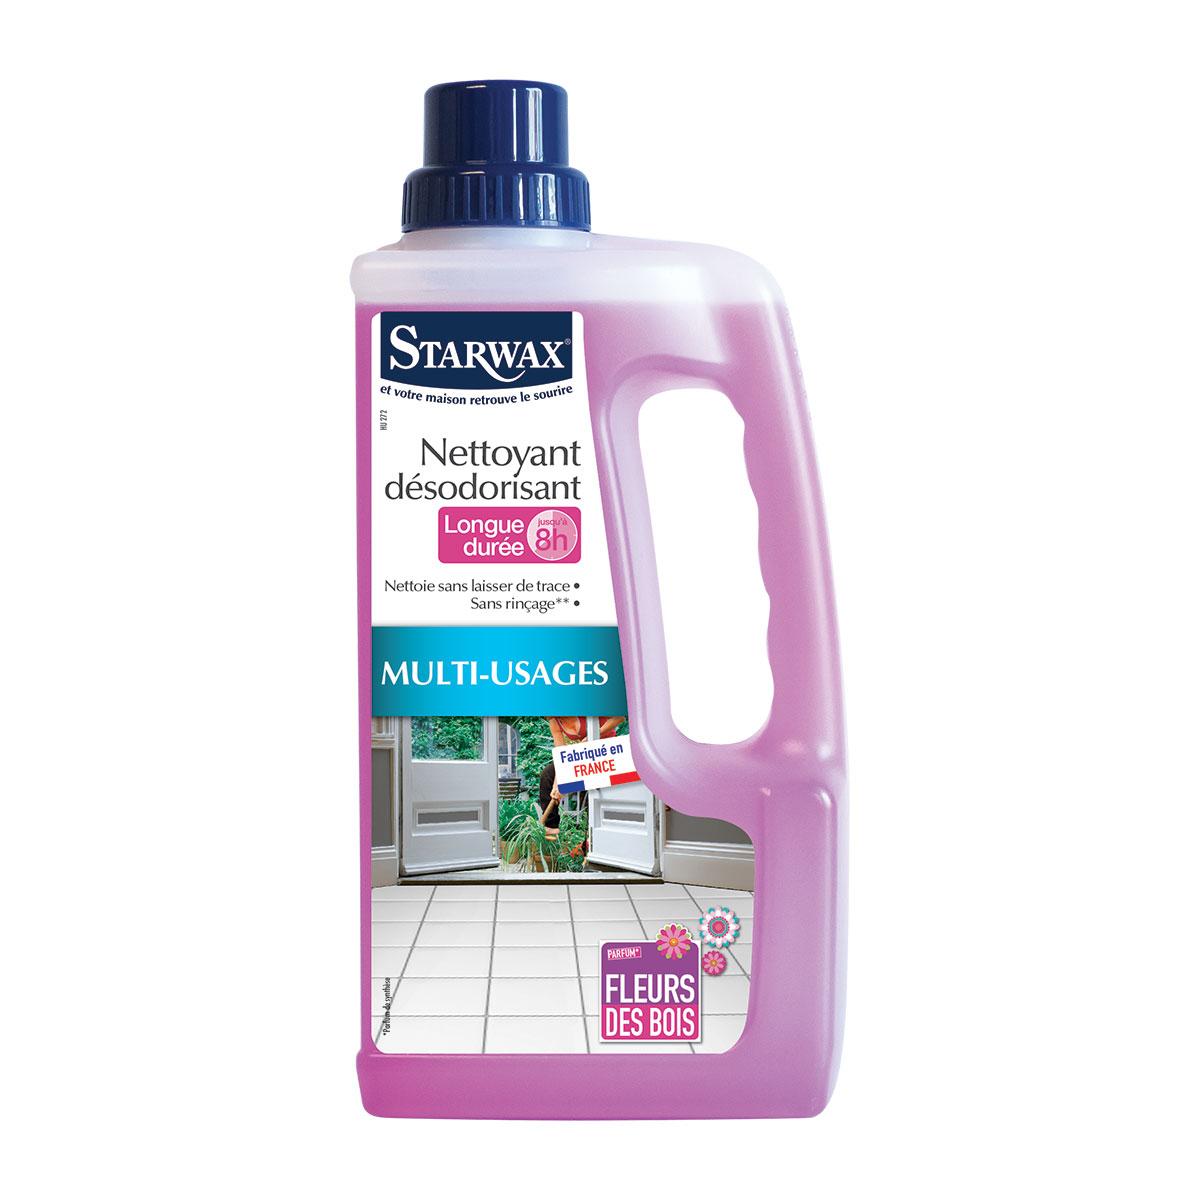 Nettoyant desodorisant fleurs des bois - Starwax